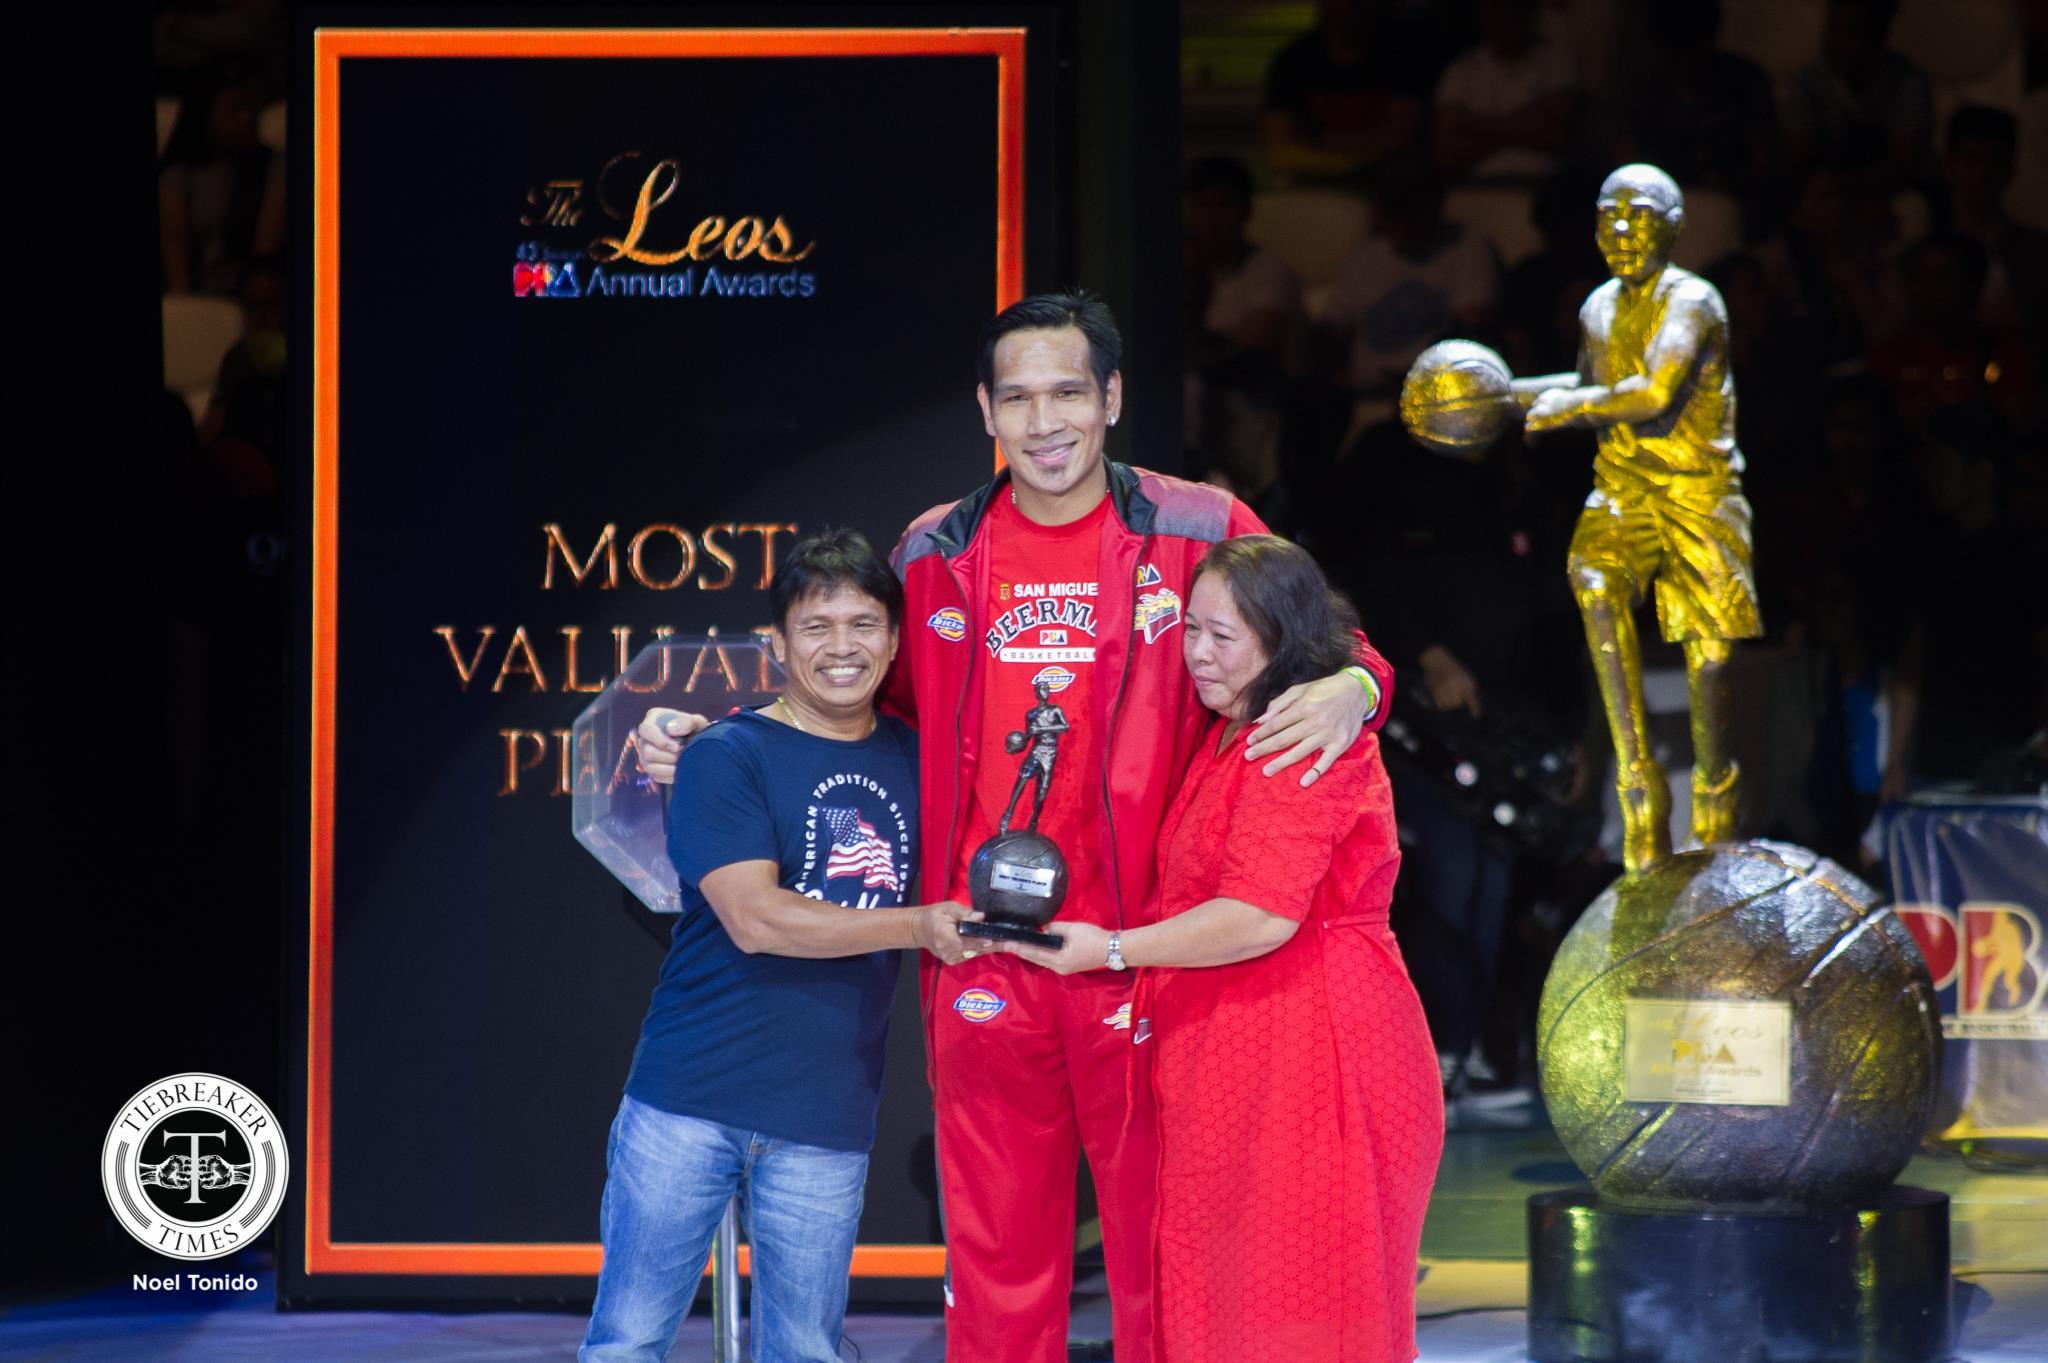 Tiebreaker Times June Mar Fajardo pays tribute to parents after winning 5th MVP plum Basketball News PBA  San Miguel Beermen PBA Season 43 June Mar Fajardo 2018 PBA Leo Awards